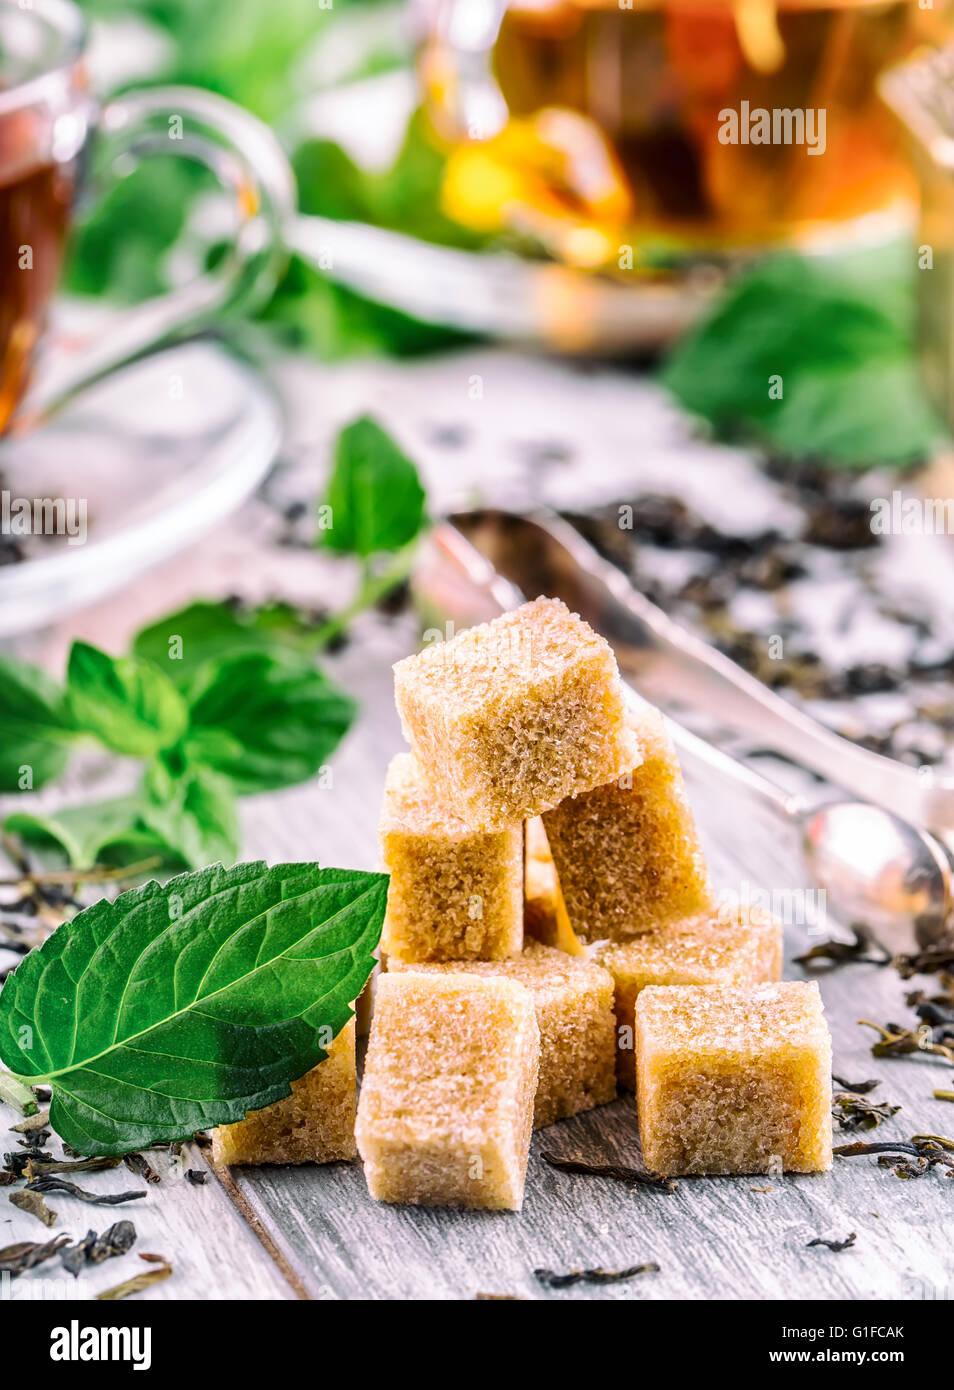 Tea. Mint Tea. Herbal tea. Mint leaf. Mint leaves. Tea in a glass cup, mint leaves, dried tea, sliced lime. herbs Stock Photo